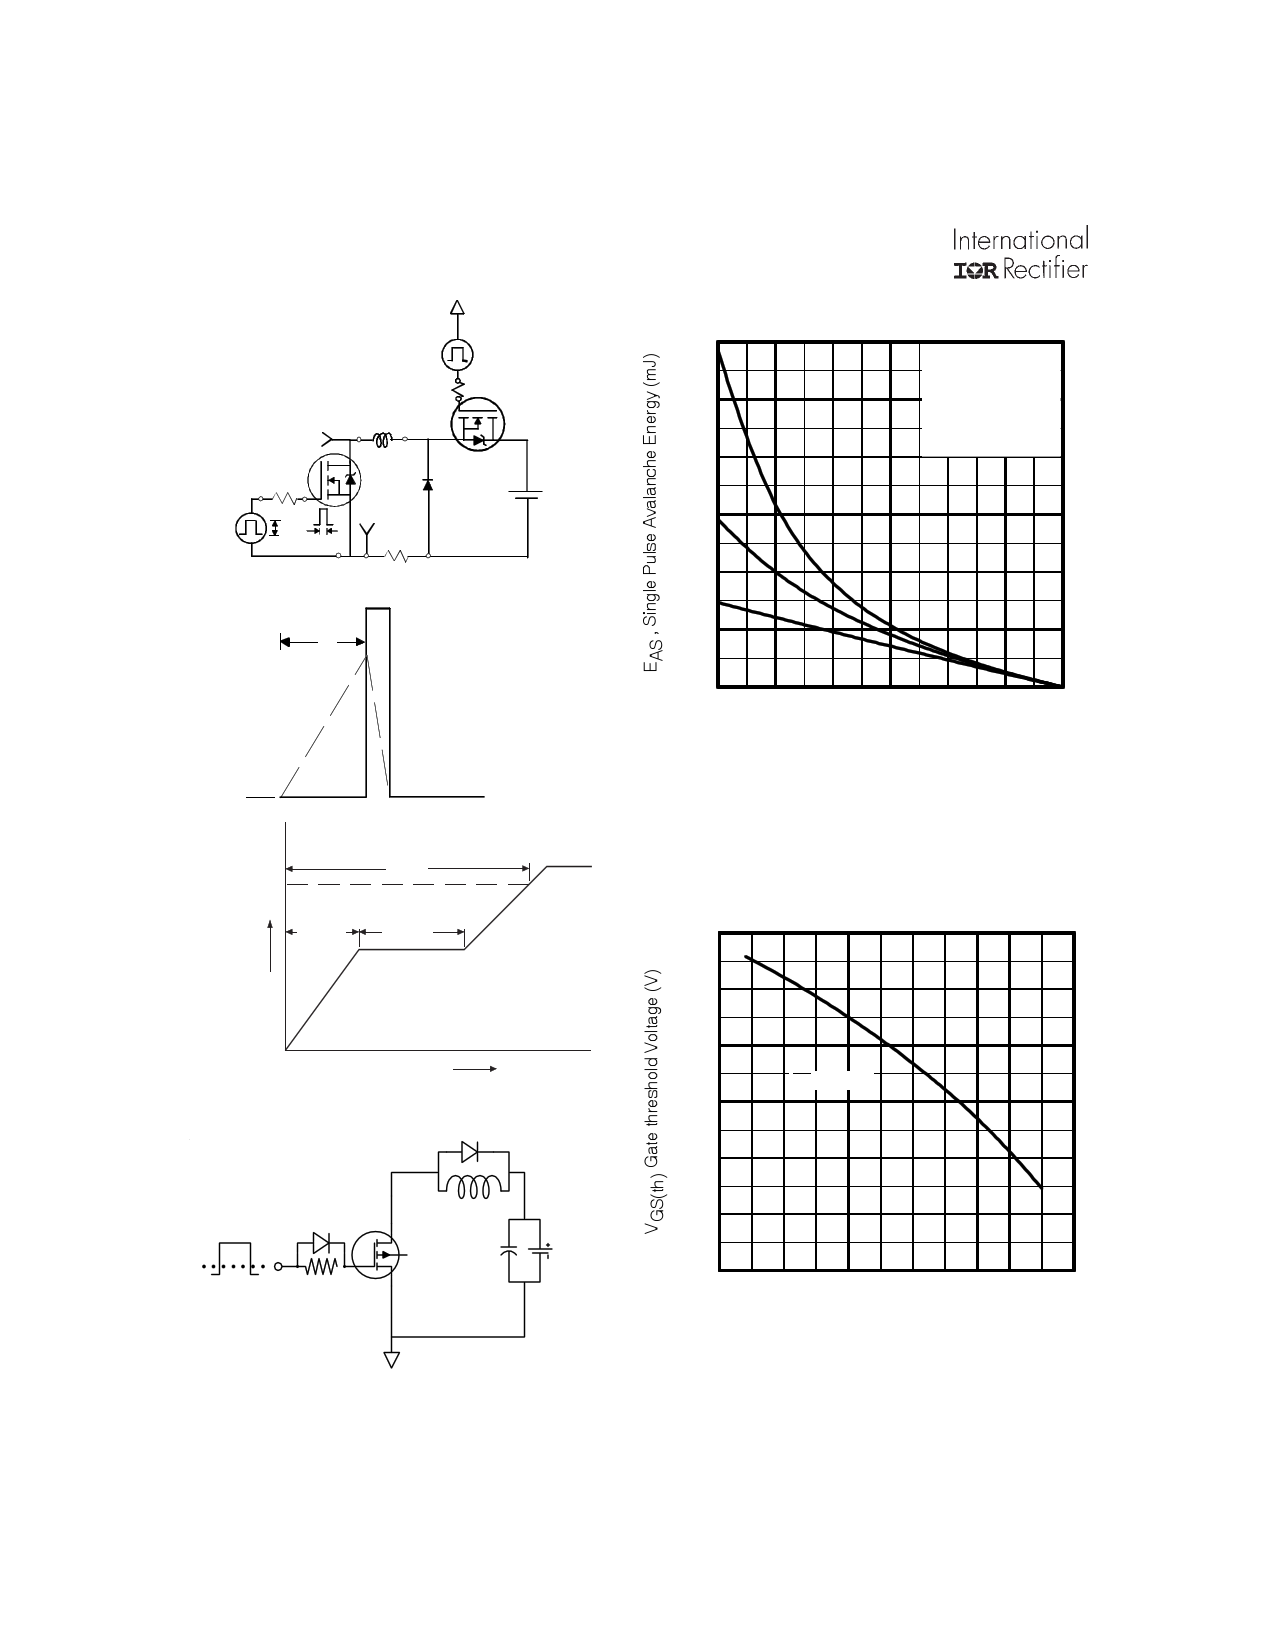 IRFZ48ZSPbF 電子部品, 半導体